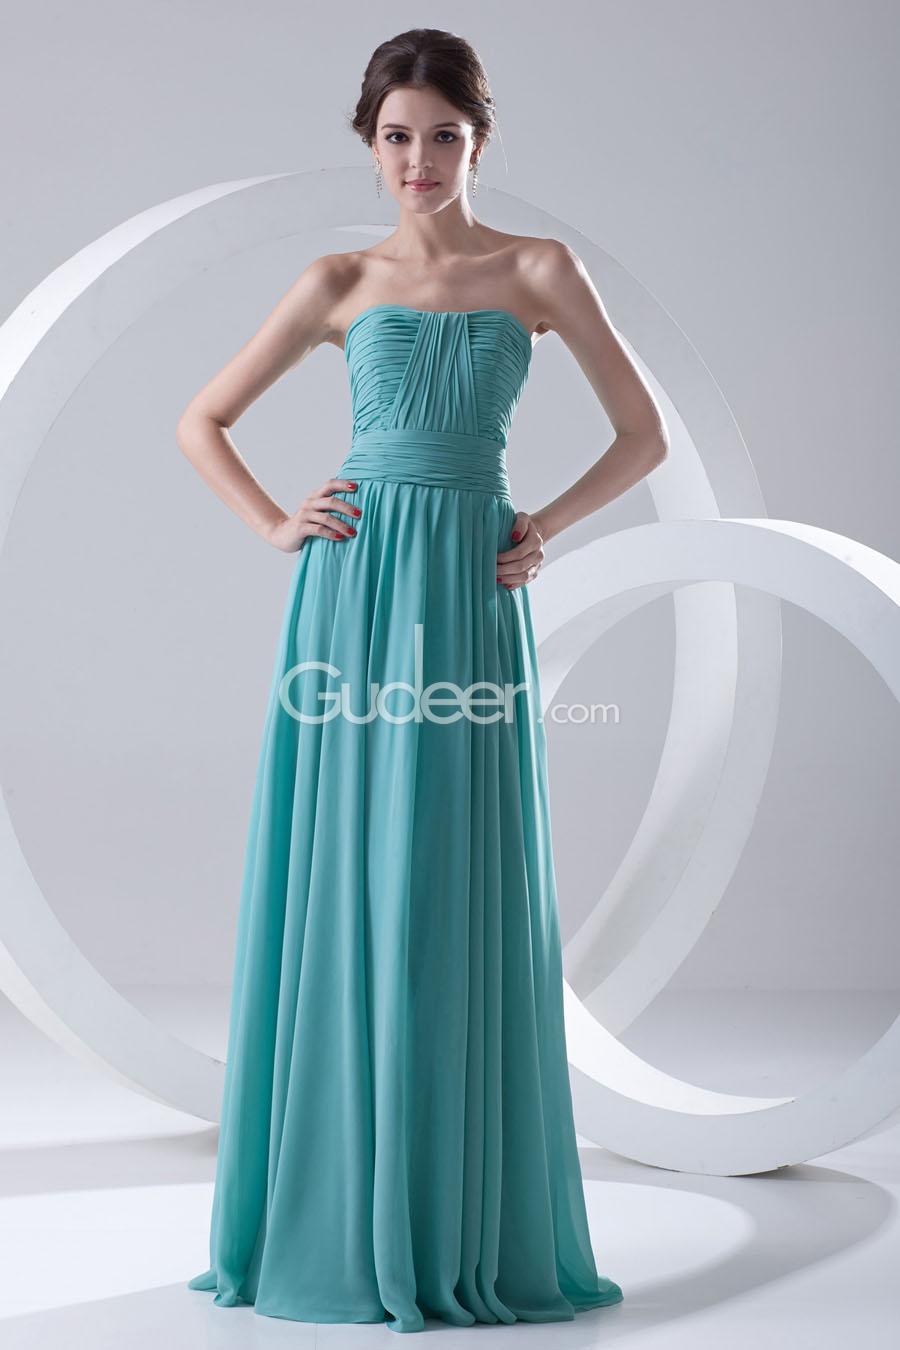 Chiffon Floor Length Bridesmaid Dresses : Clothing Brand Reviews